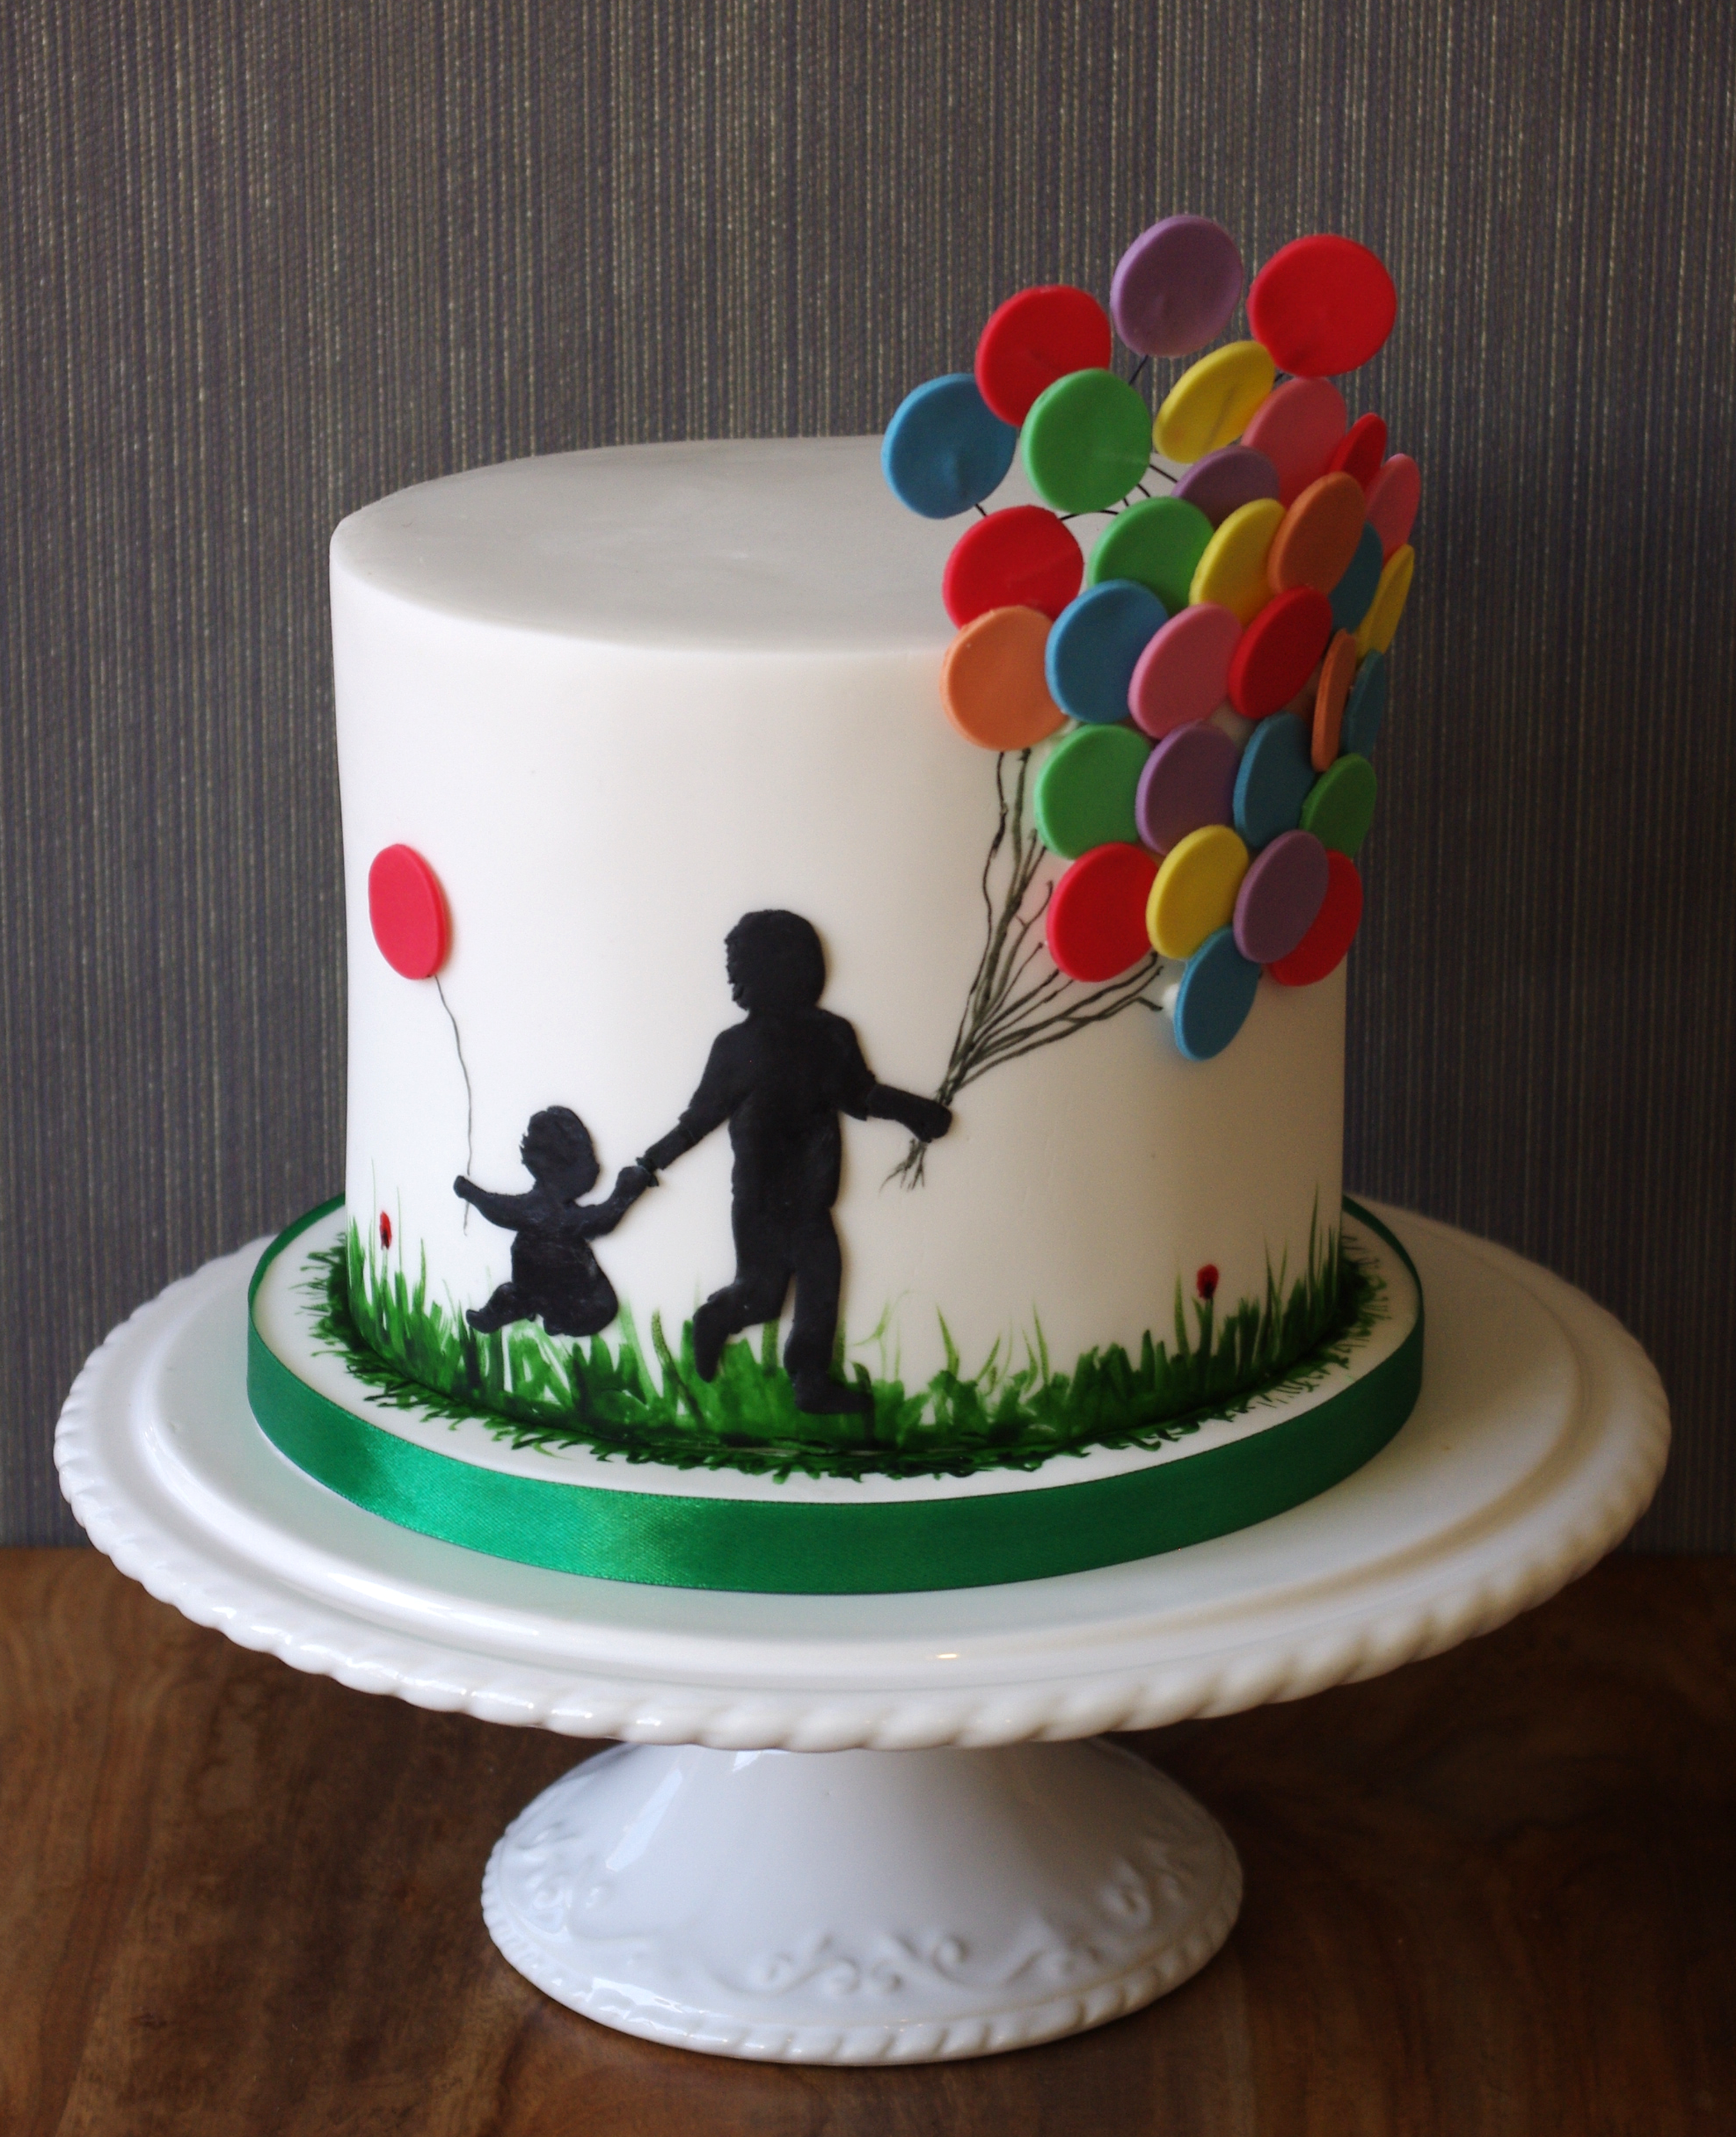 Balloon silhouette cake